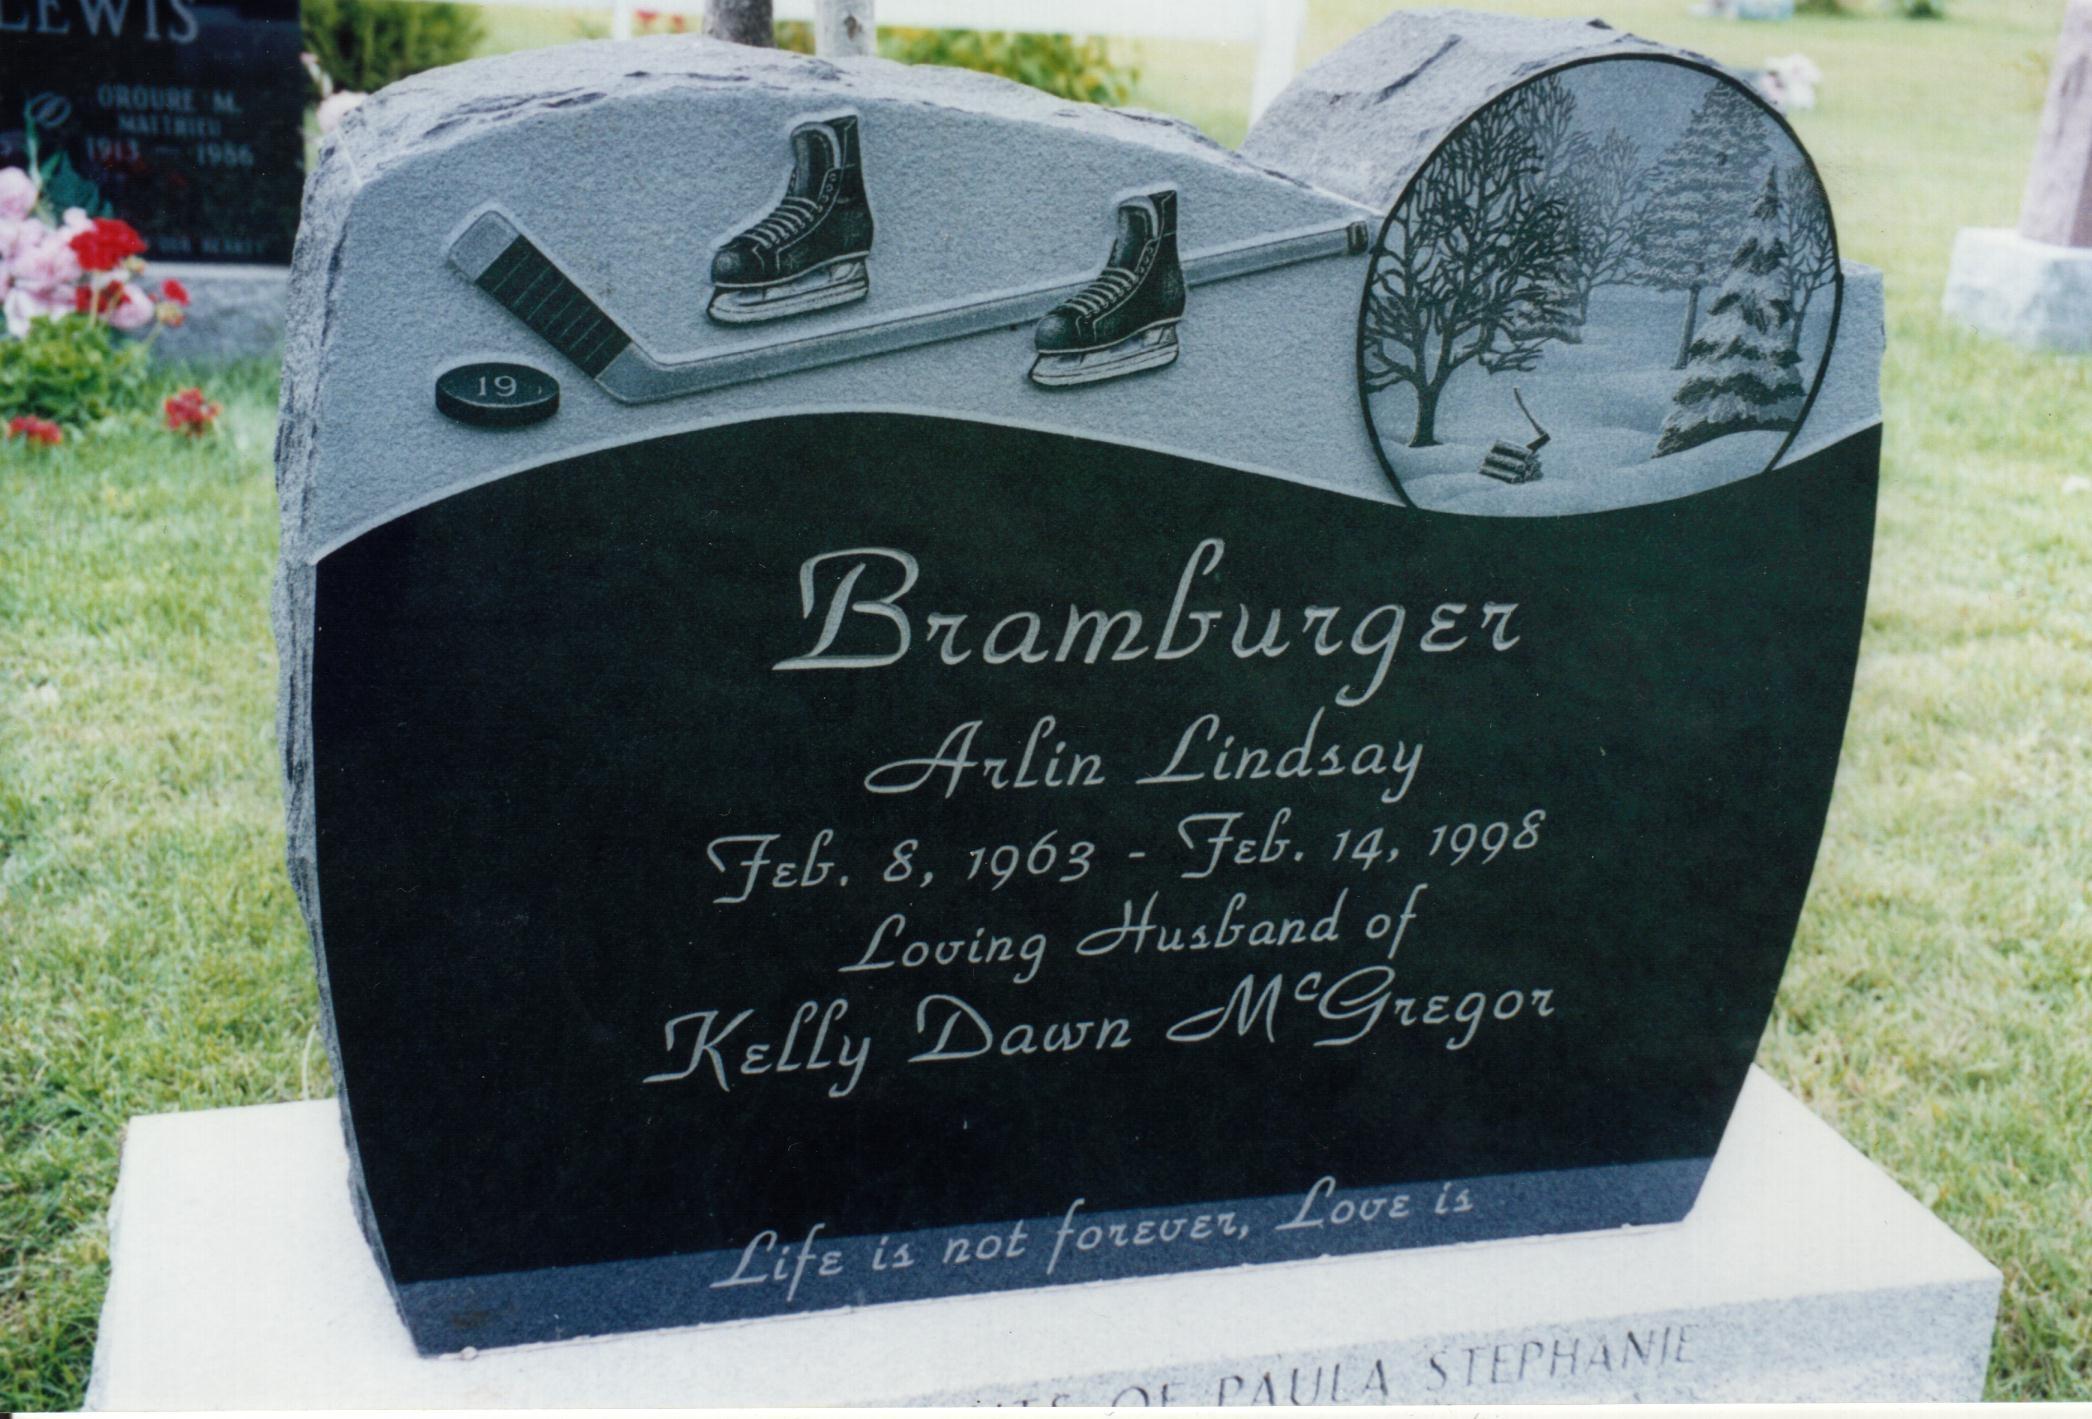 Bramburger